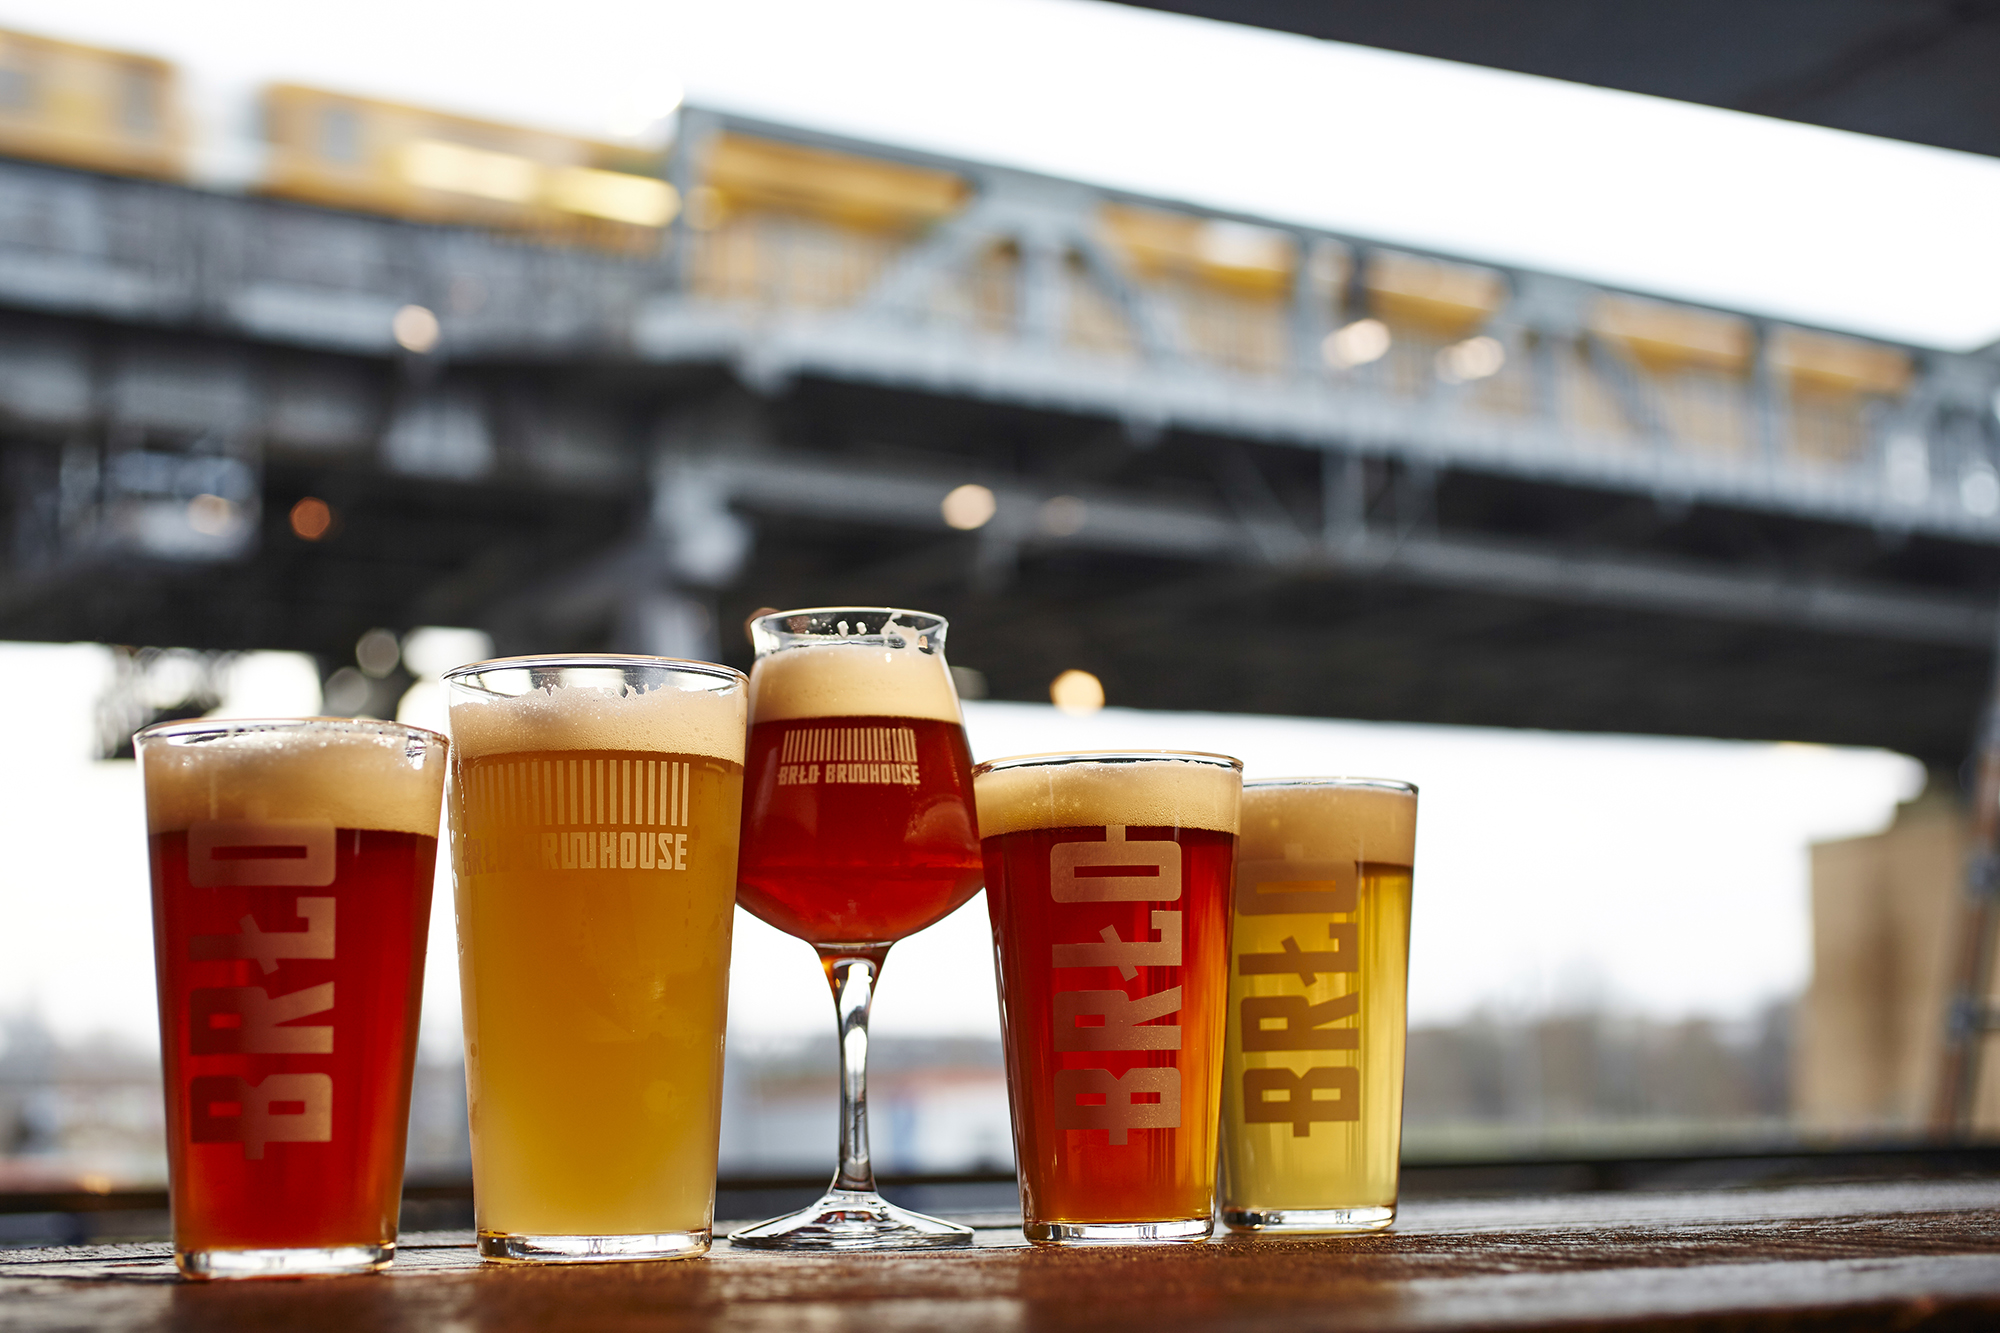 Beer at BRLO Brwhouse - a craft beer bar, restaurant and beer garden in Berlin